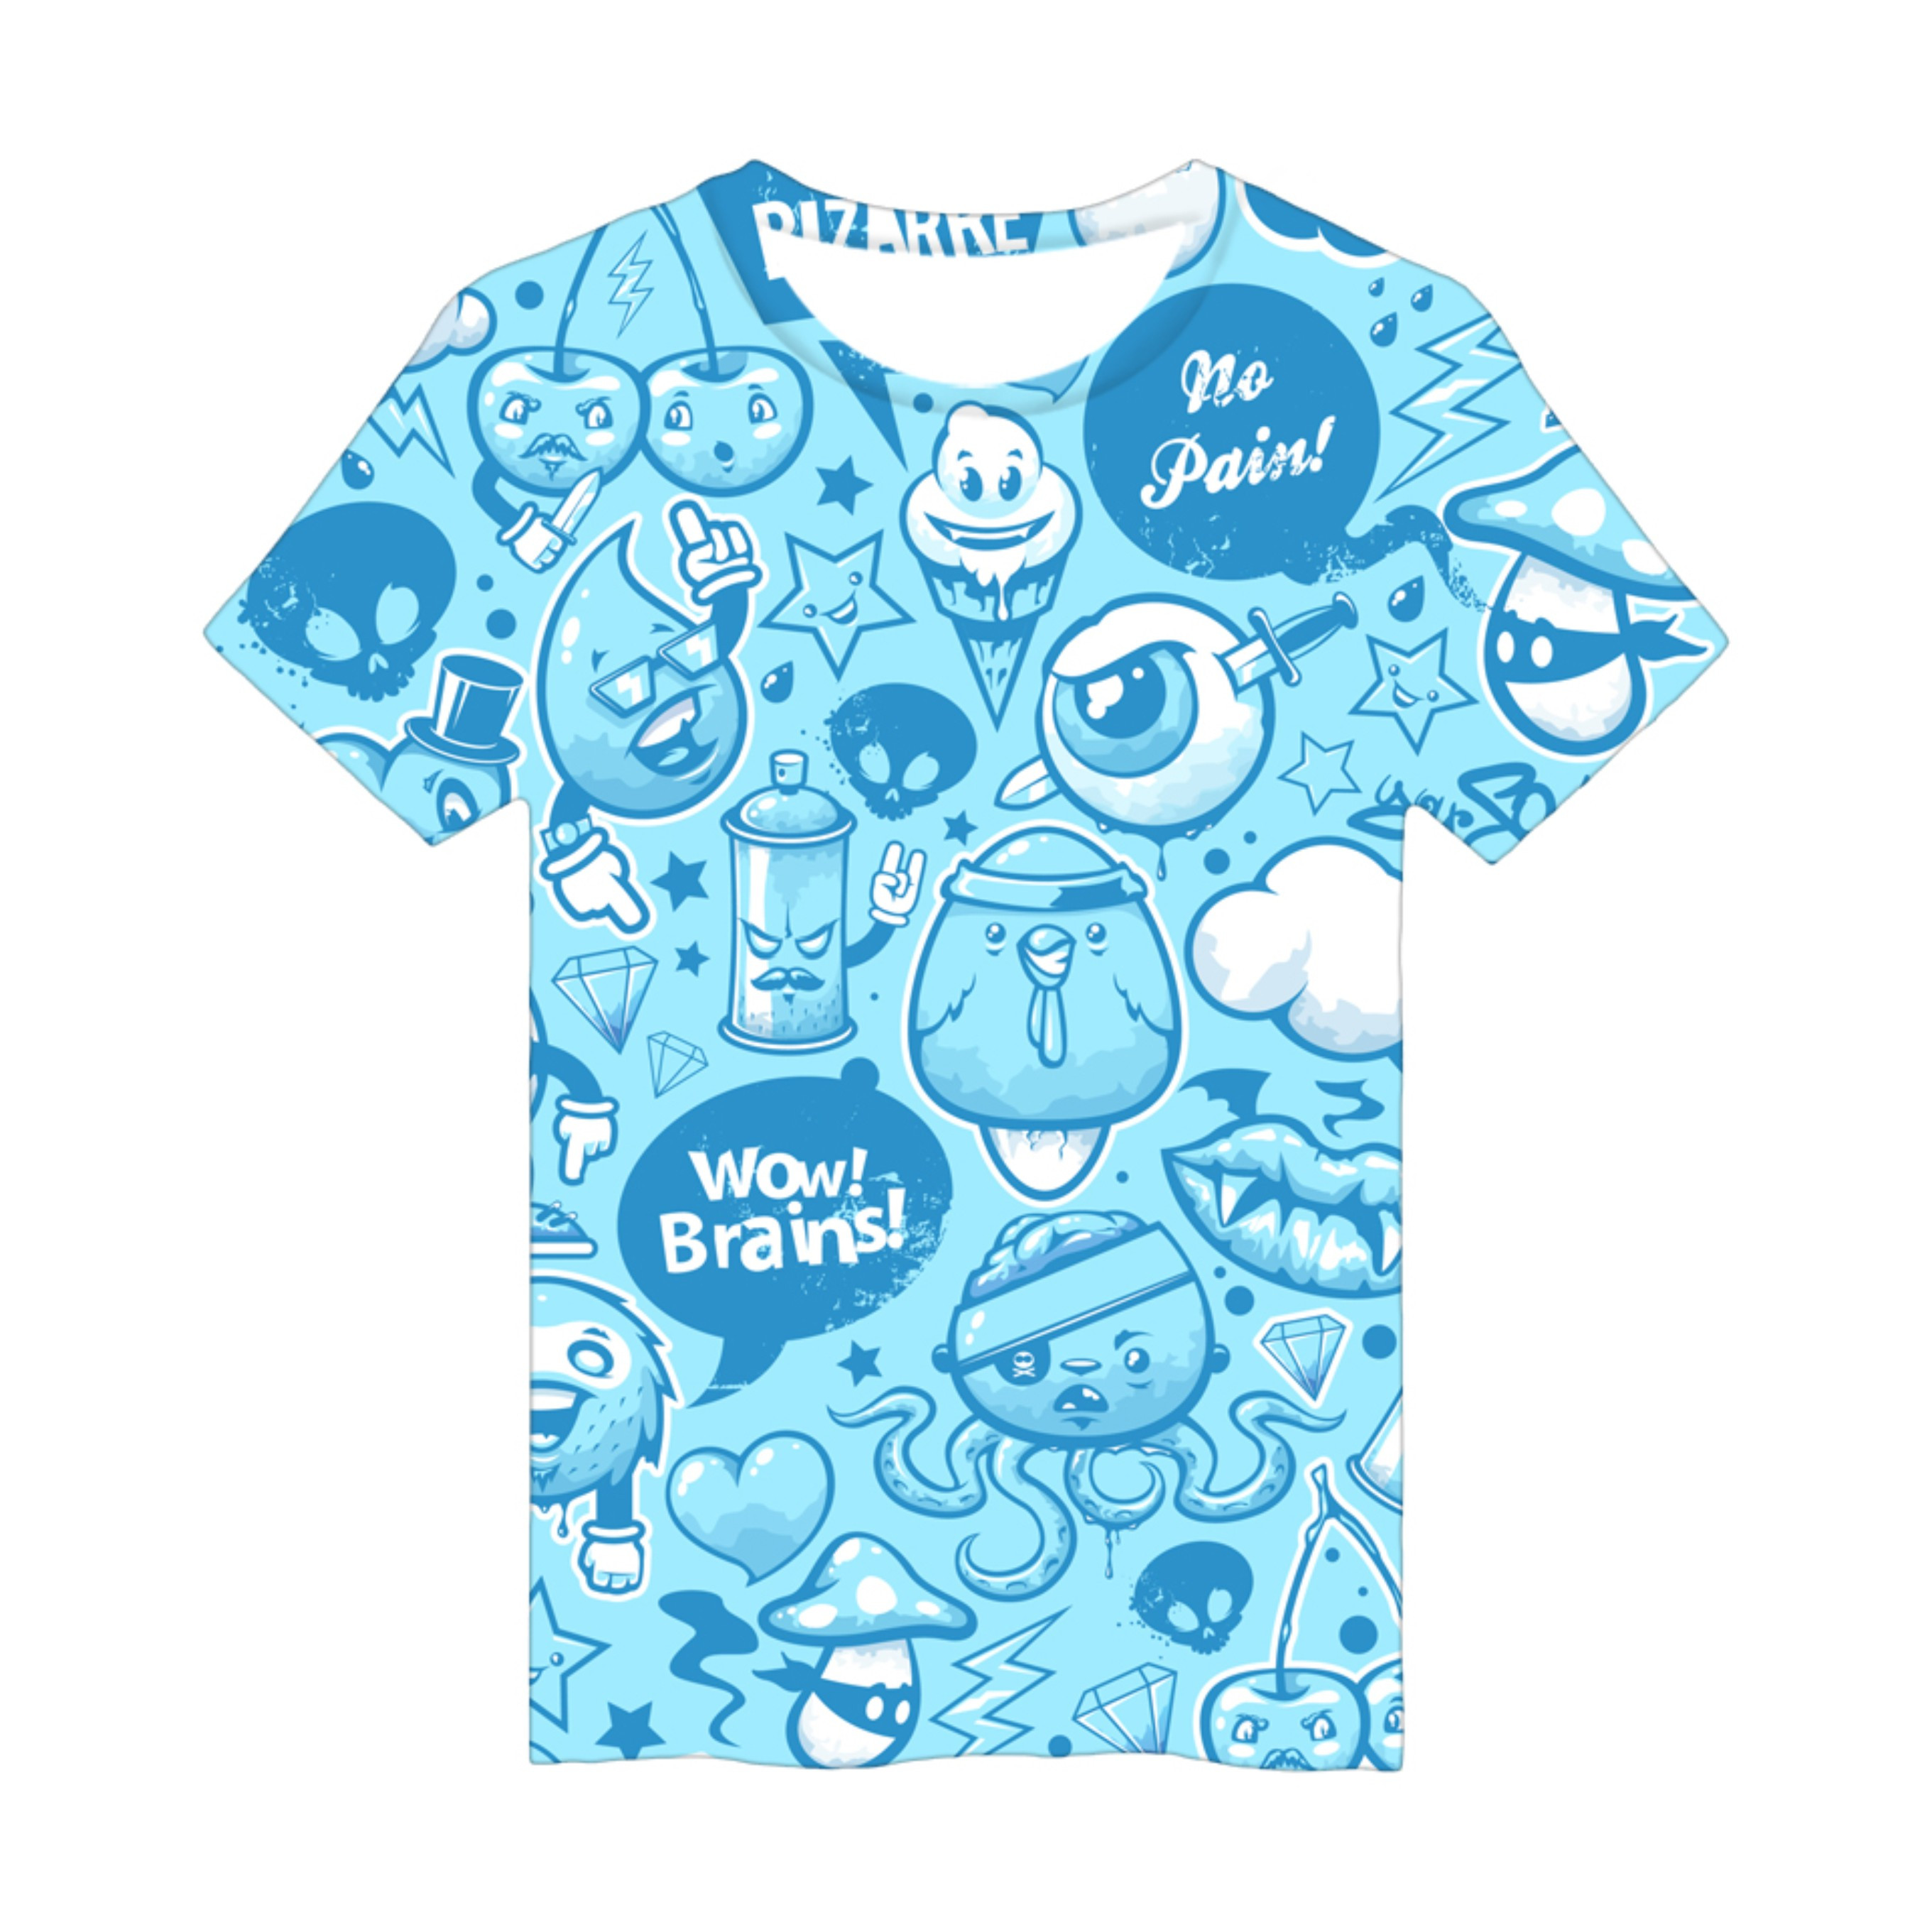 BTS 2018 Graffiti T-Shirt 3D Print Short Sleeve Comics funny tshirt Summer T-Shirt Men/Women Casual Tops TShirts 4XL Large size